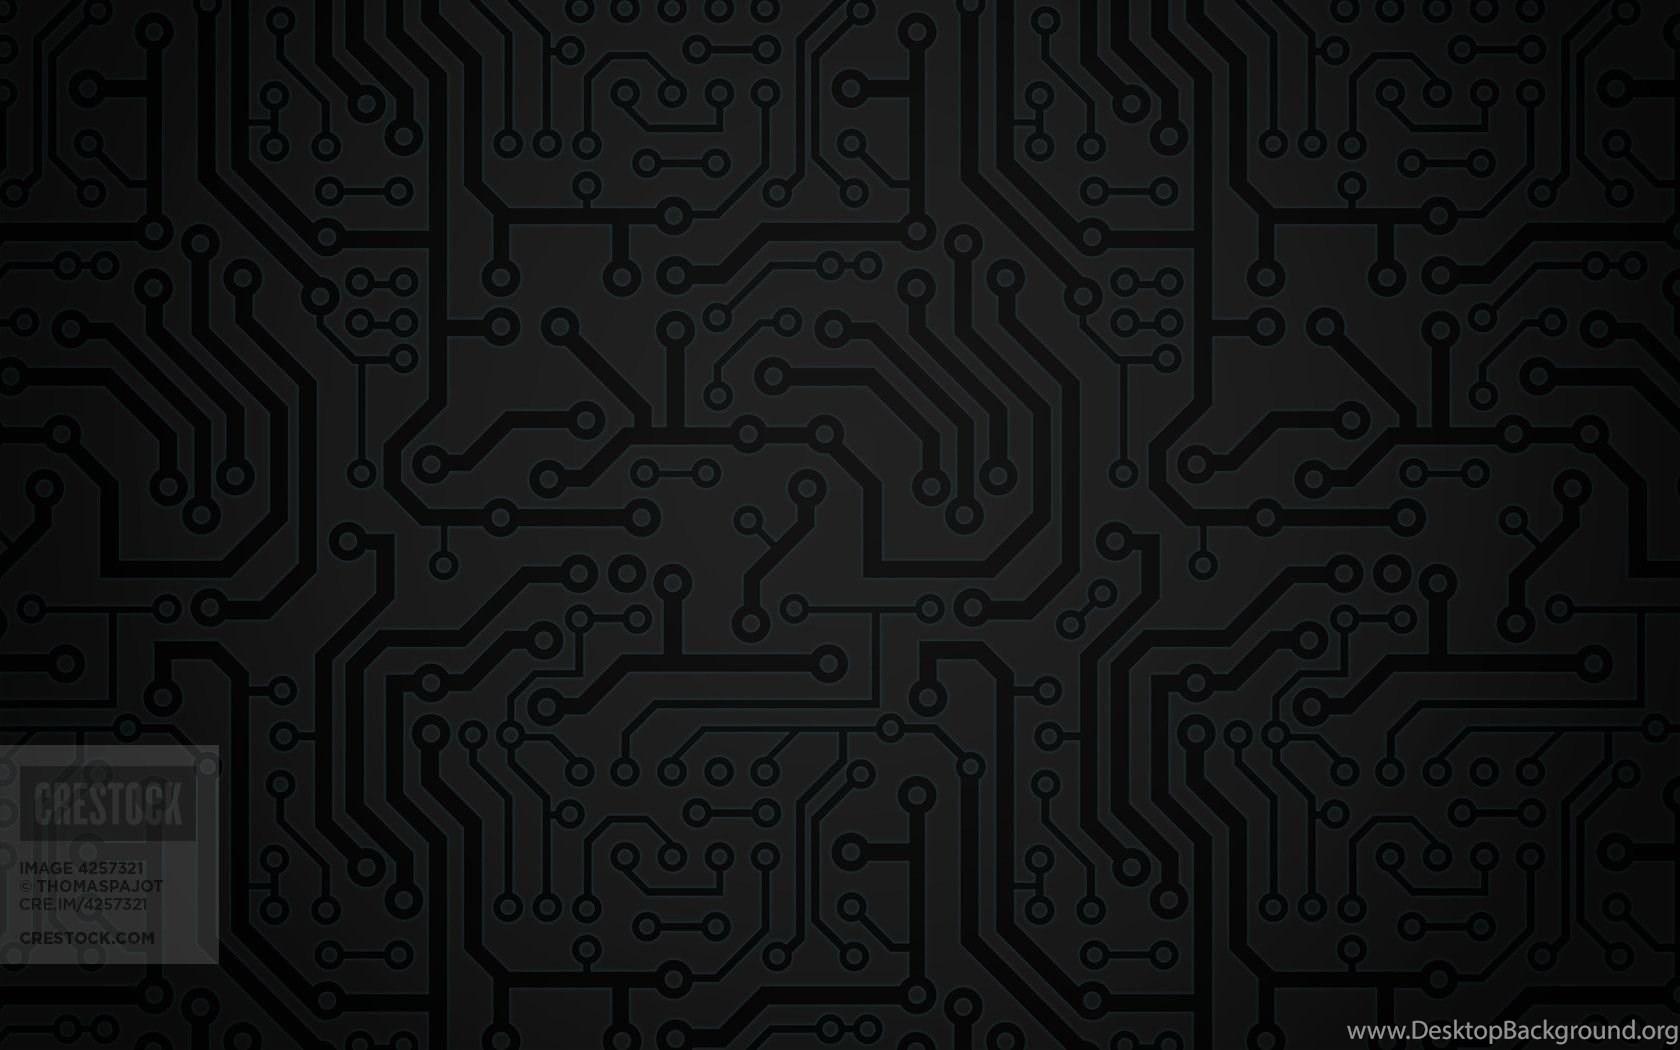 Circuit board wallpapers desktop background - Circuit board wallpaper android ...